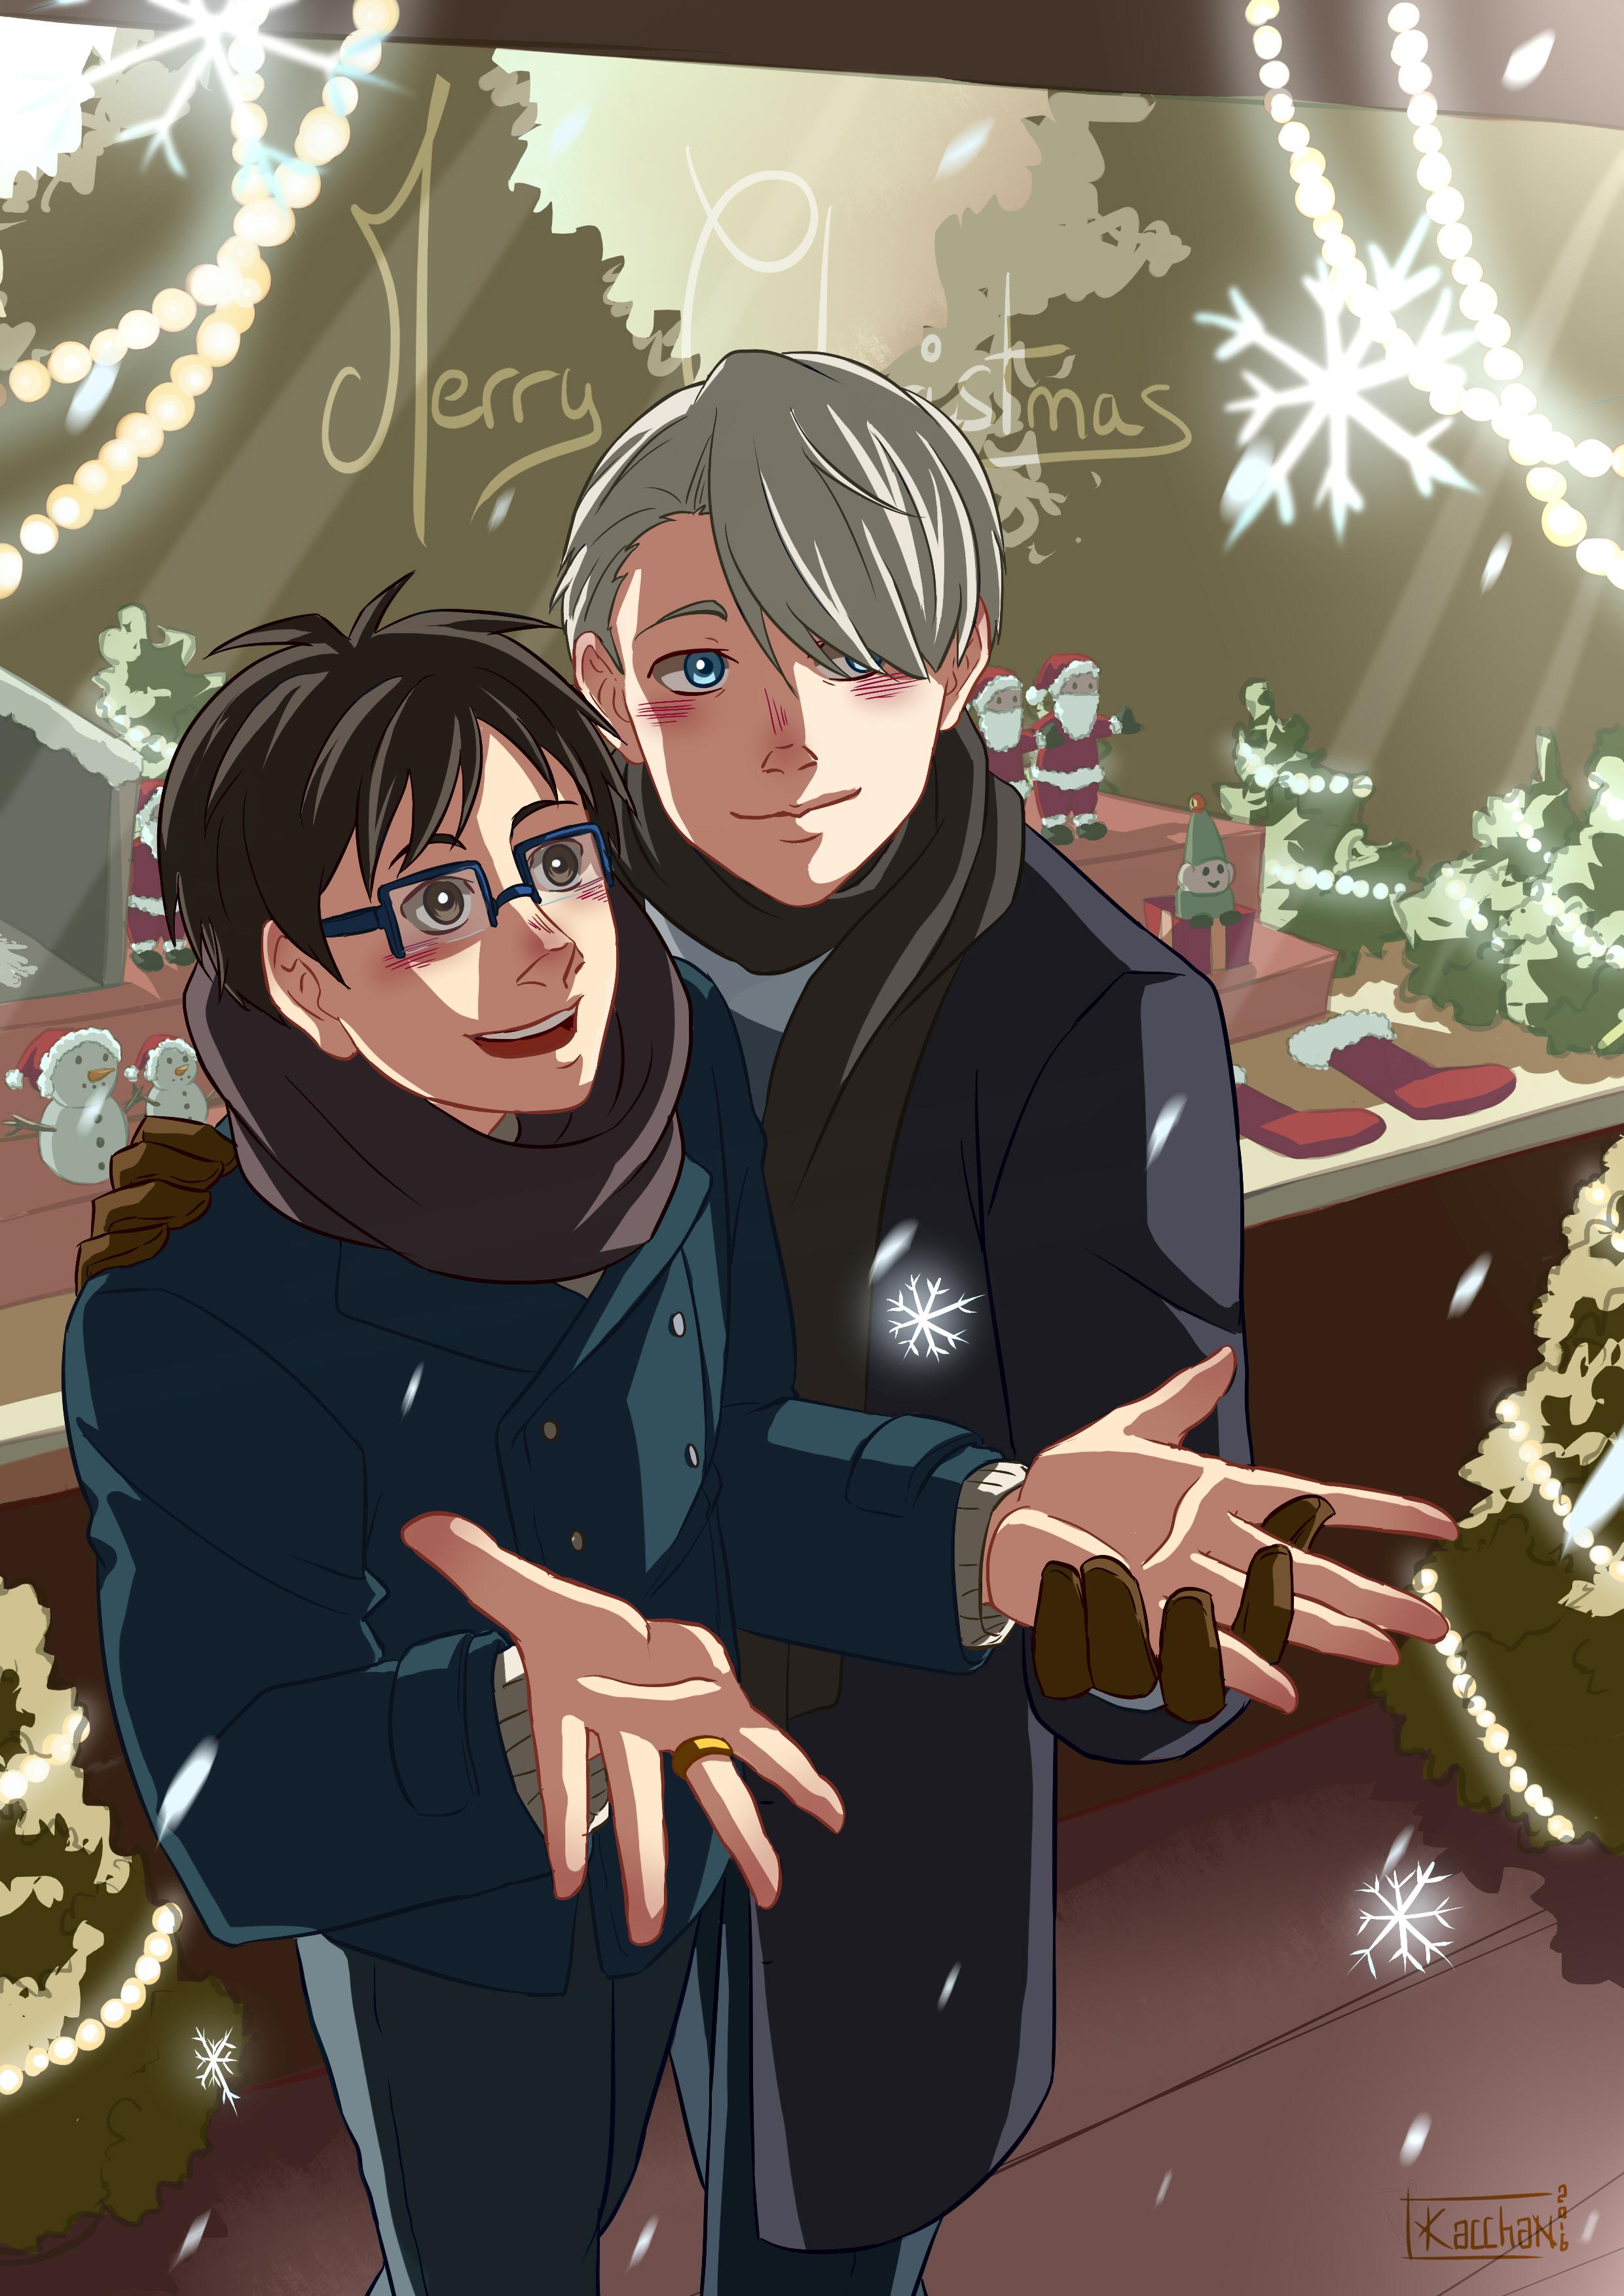 Yuri!!! On Ice Mobile Wallpaper #2061939 - Zerochan Anime Image Board